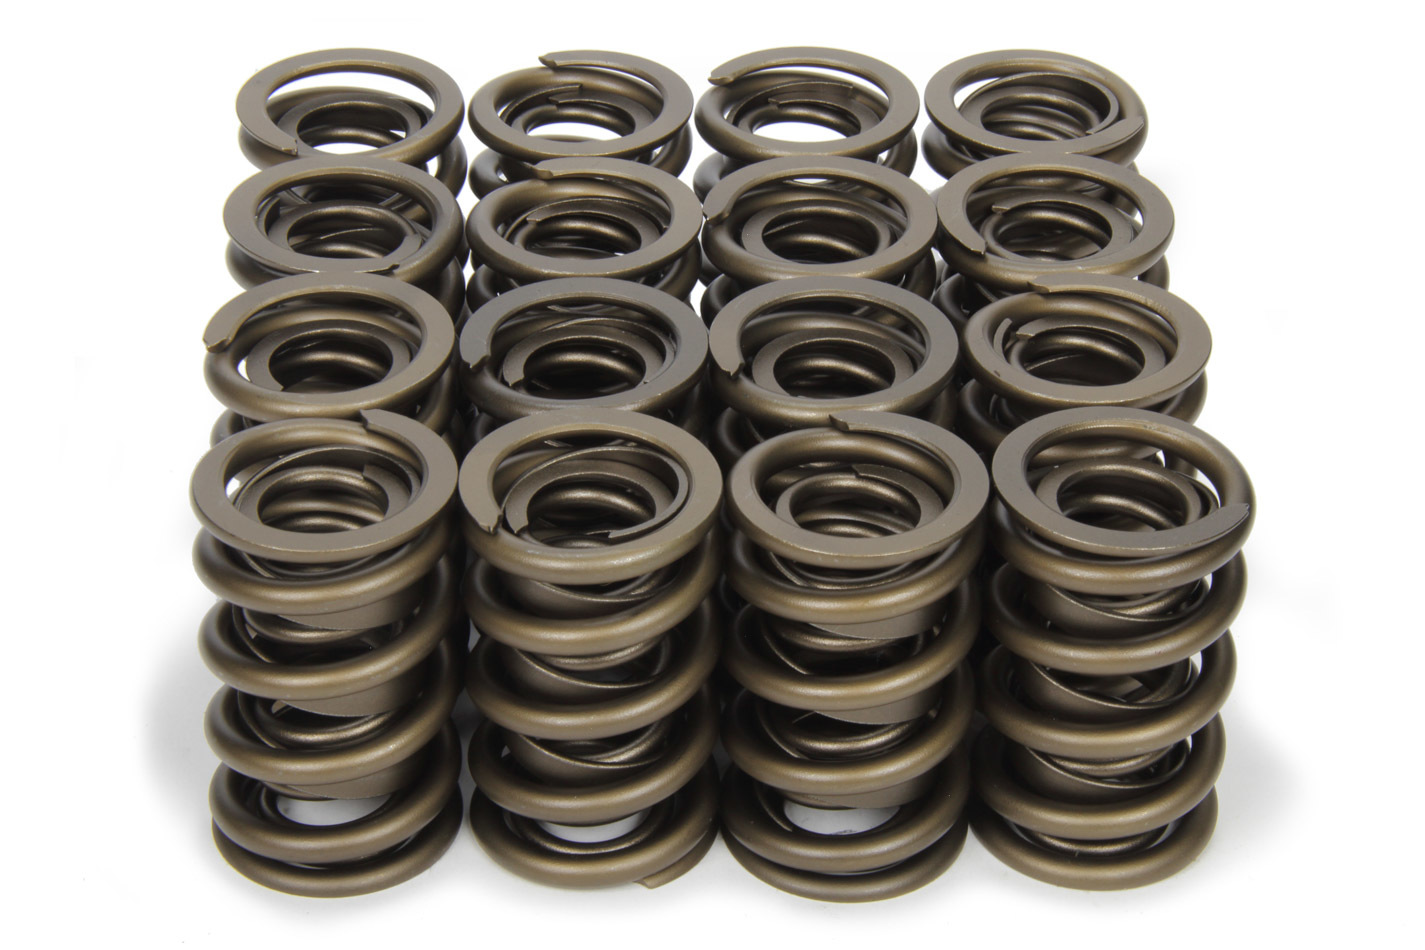 PAC Racing Springs PAC-1297 Valve Spring, RPM Series, Dual Spring / Damper, 500 lb/in Spring Rate, 1.130 in Coil Bind, 1.539 in OD, Set of 16